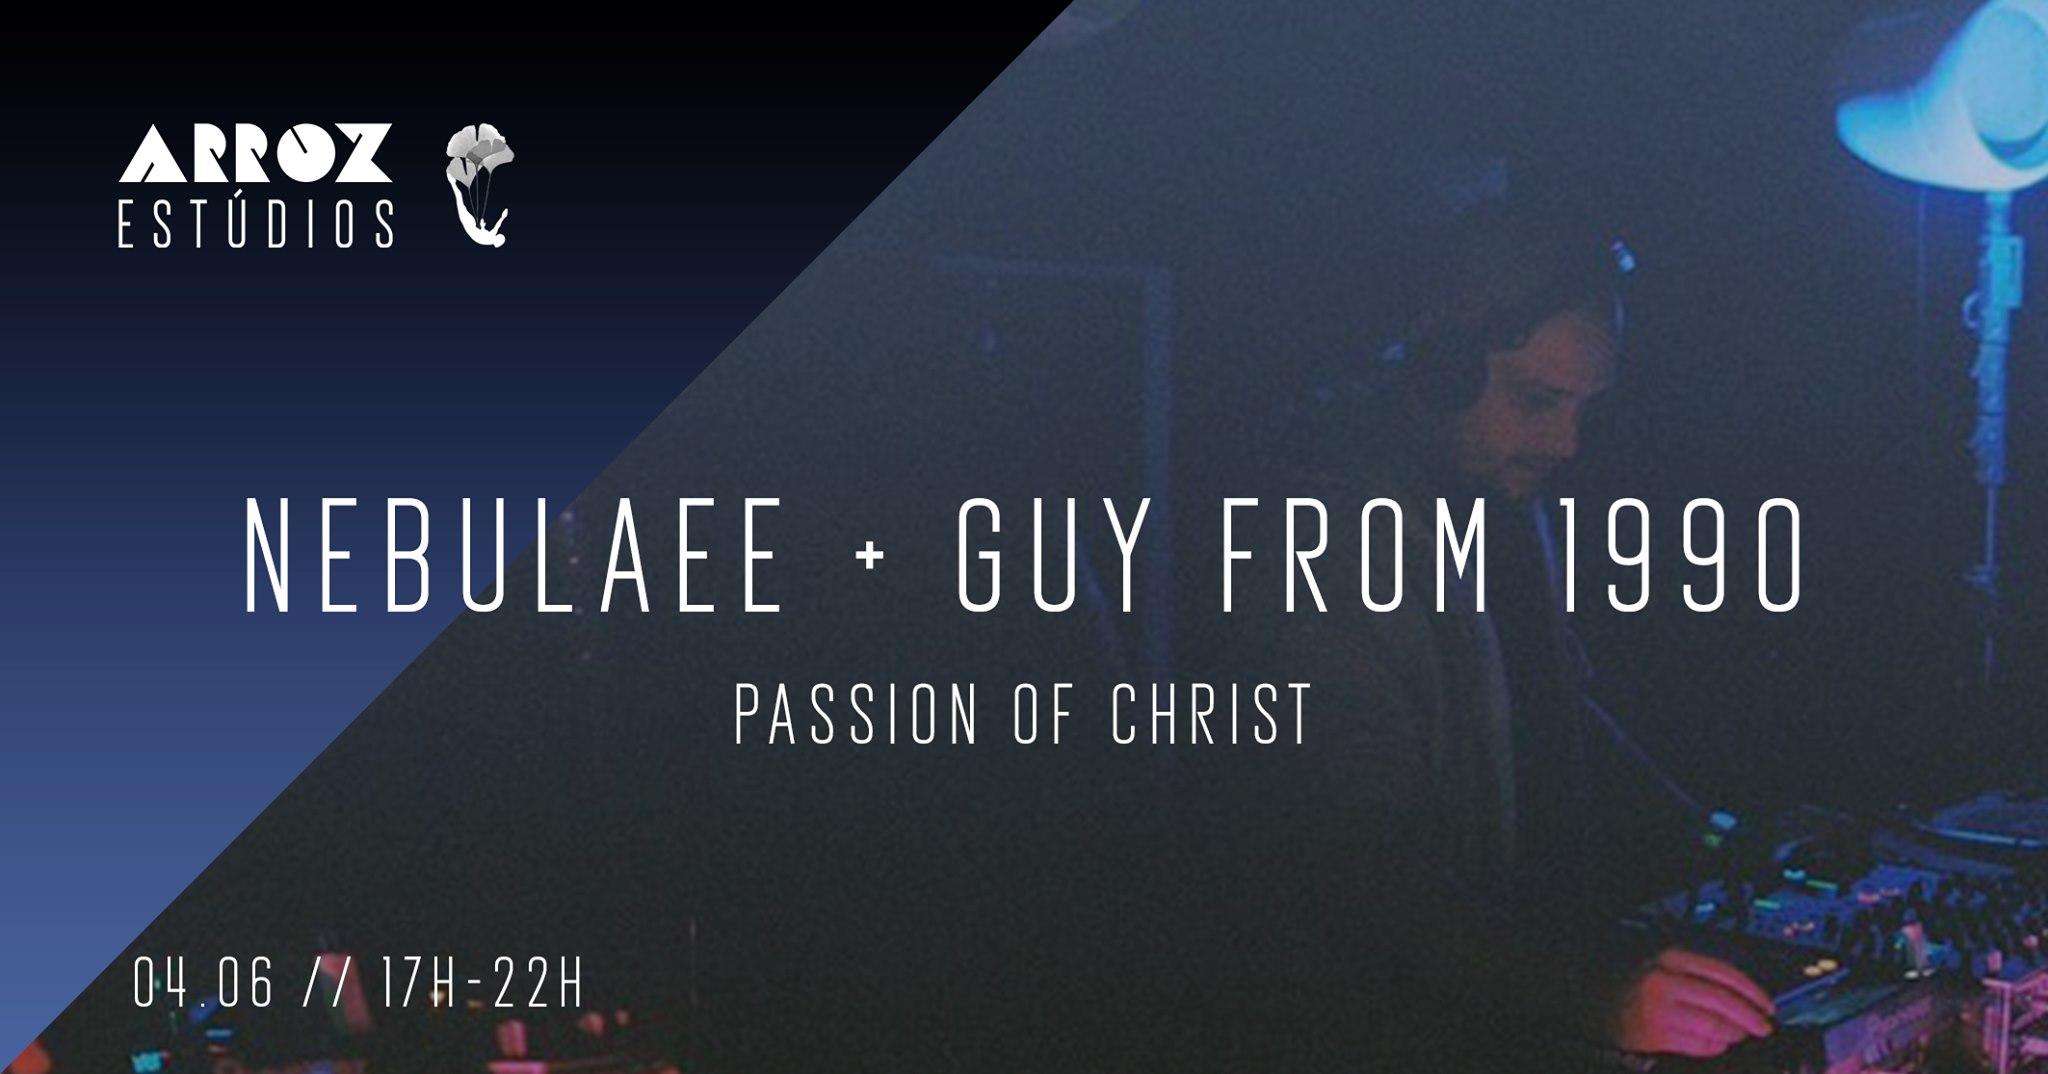 Nebulaee + Guy from 1990